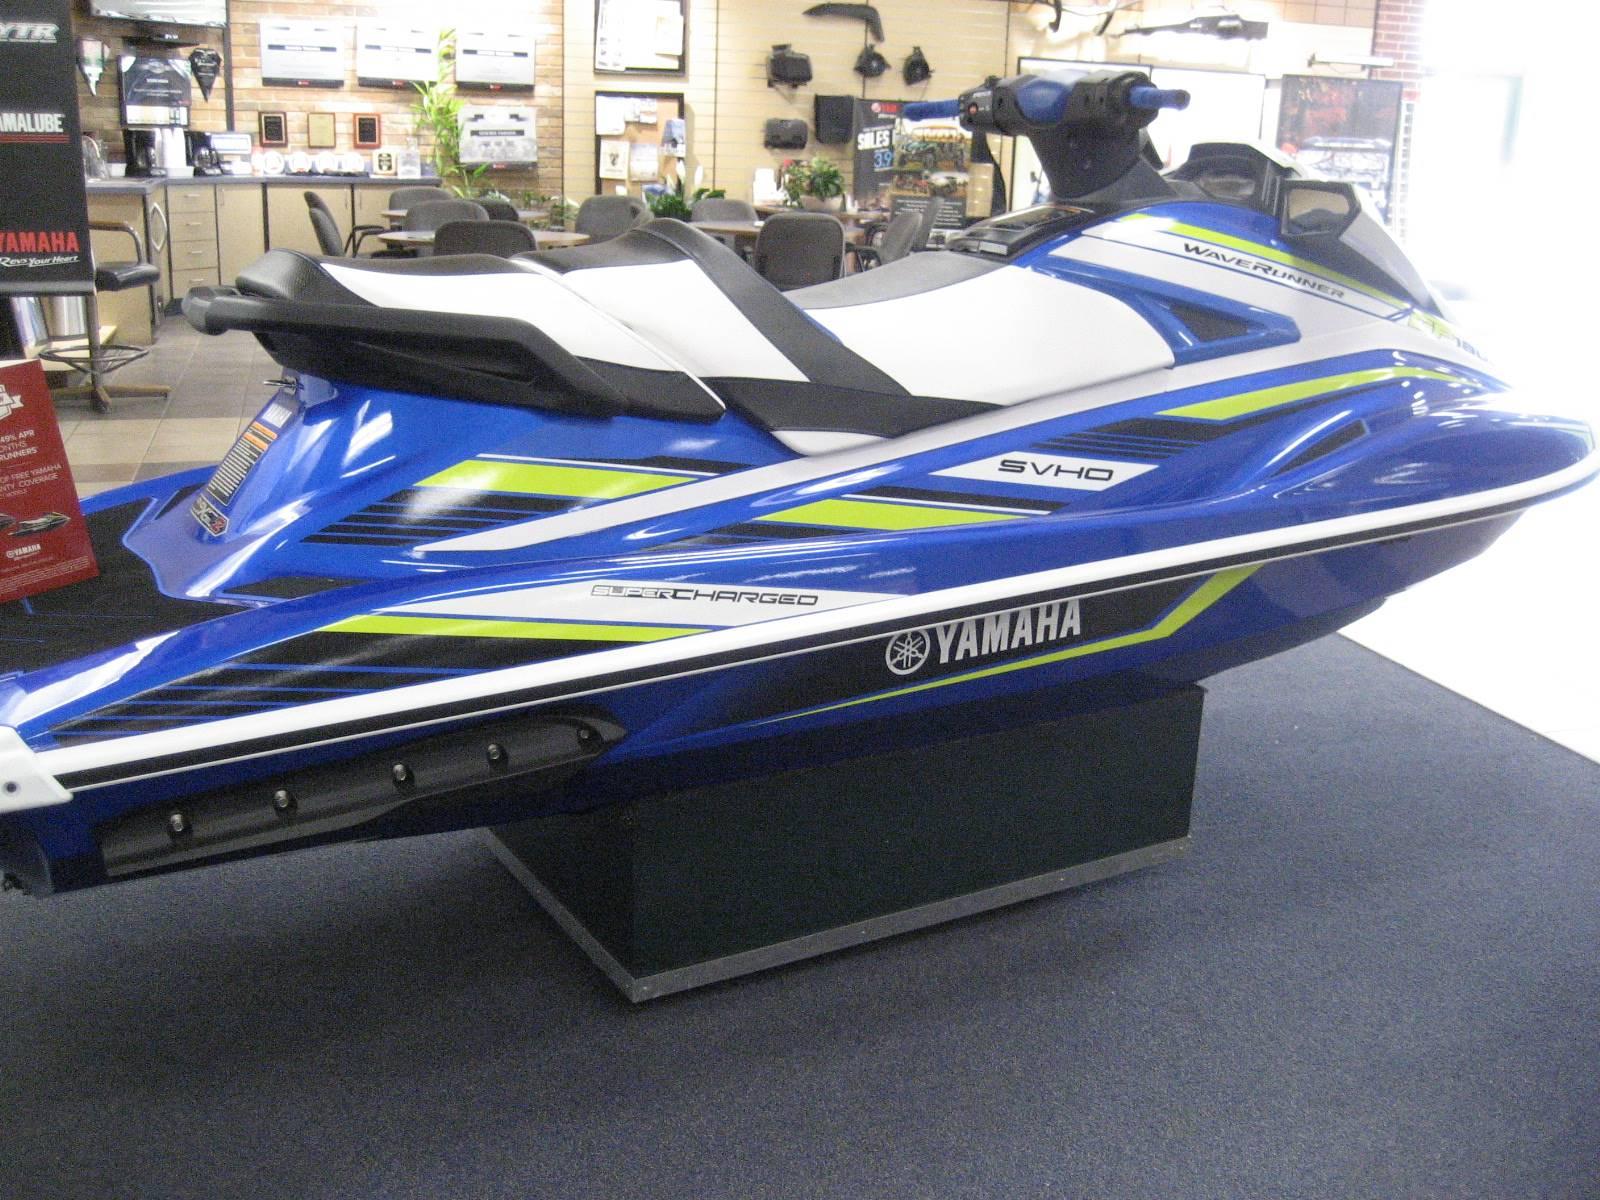 New 2019 Yamaha GP1800R Watercraft in Shawnee, OK | Stock